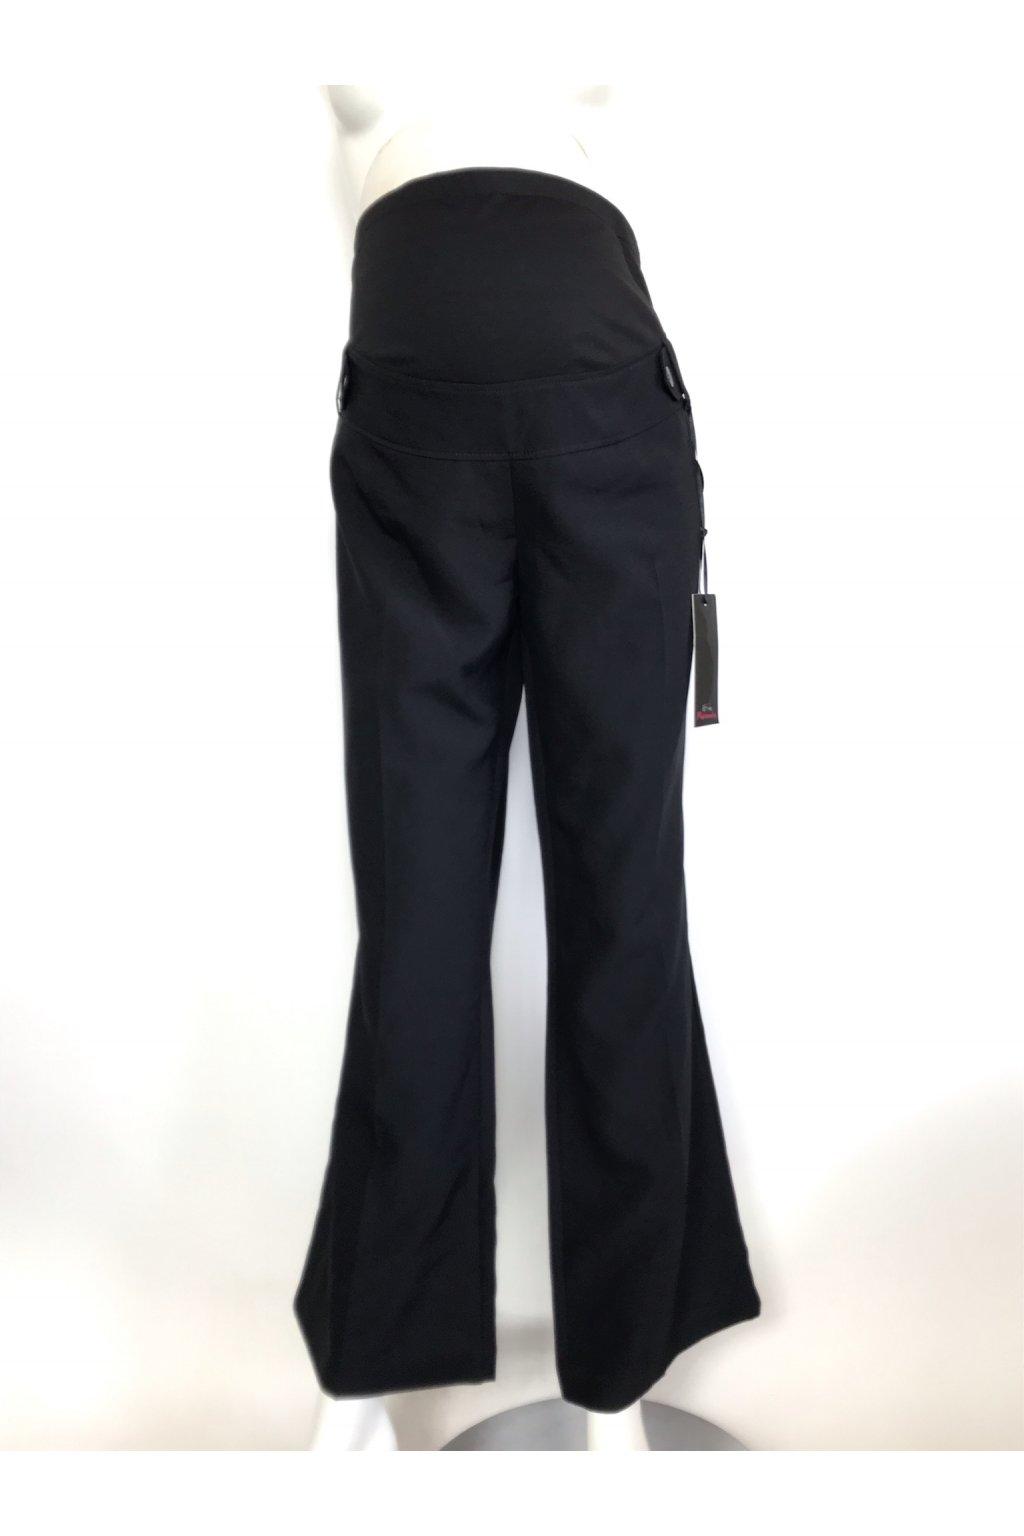 6610 1 tehotenske kalhoty e vie cerne vel 44